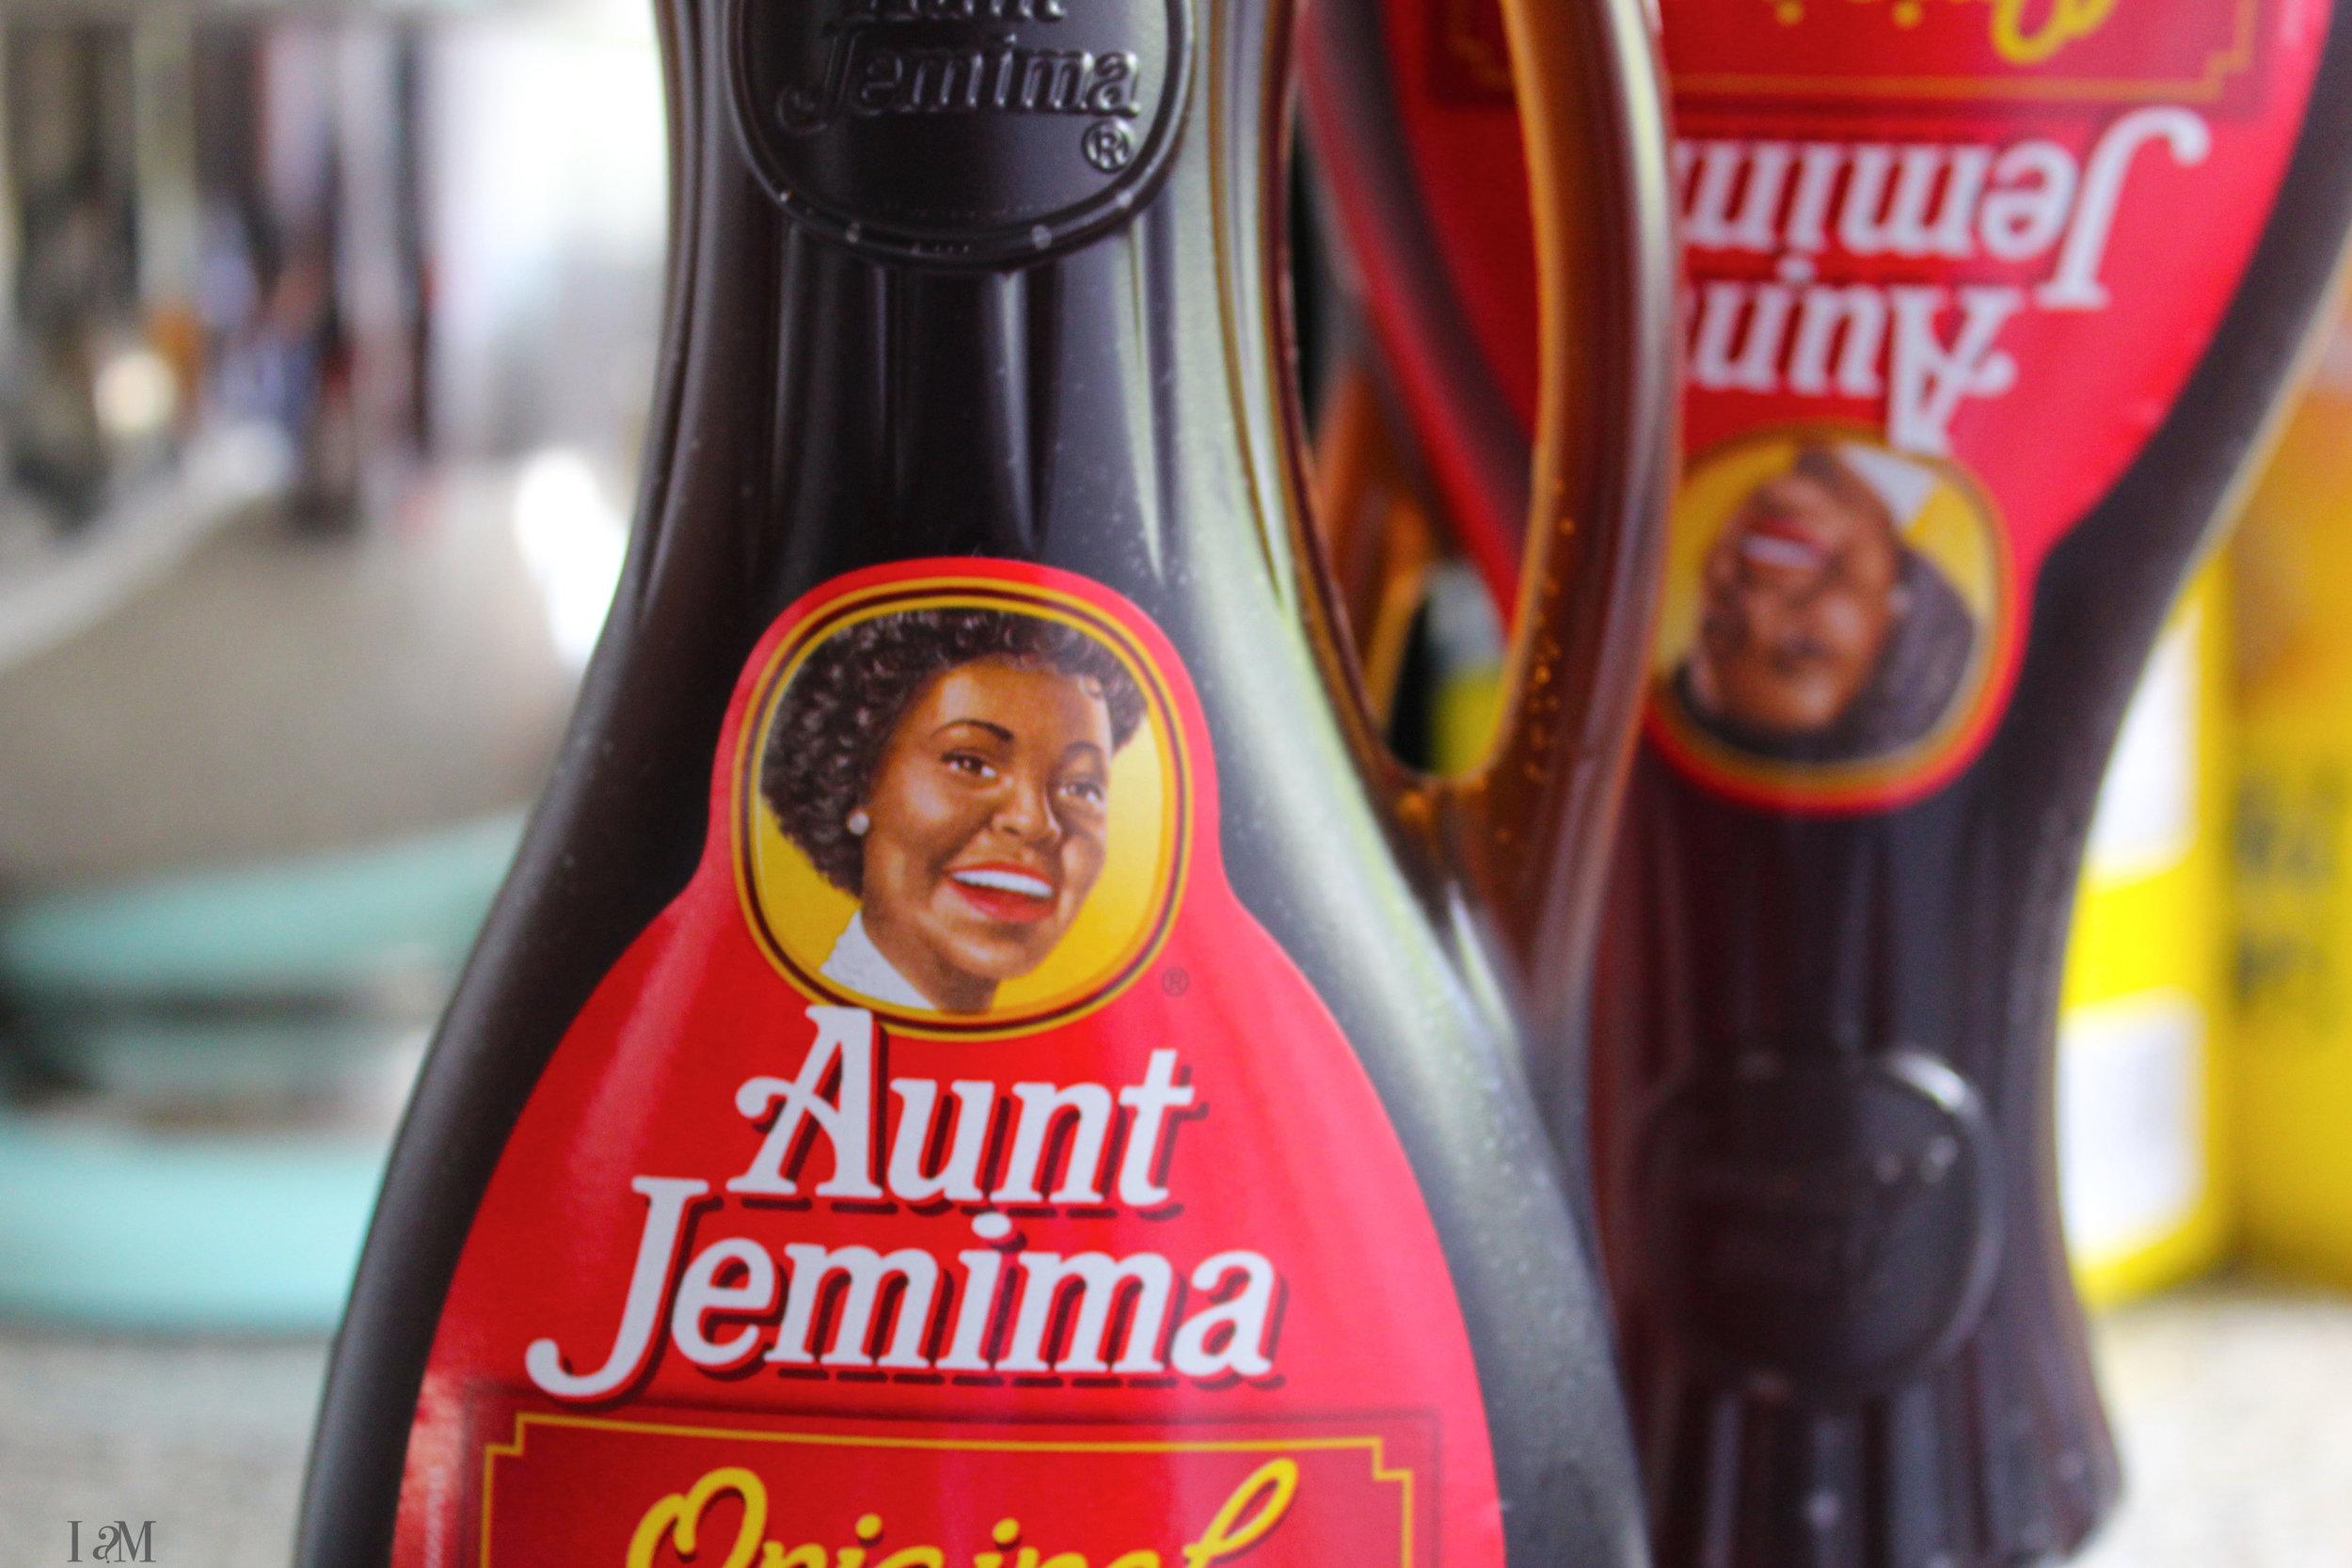 Aunt Jemima.jpg